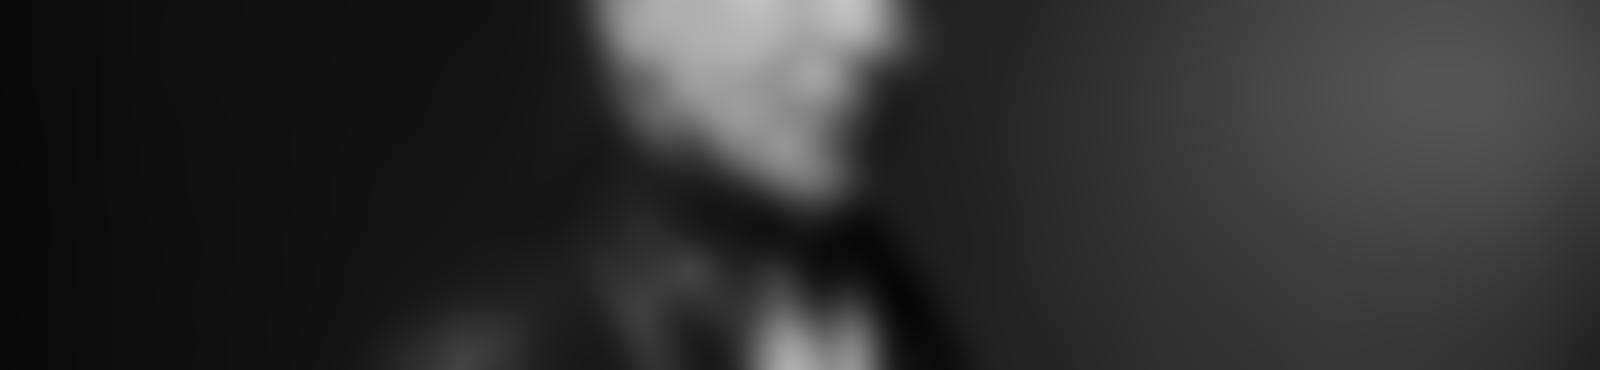 Blurred e3f50612 0cfa 4576 a485 0fca7b4cc6ba